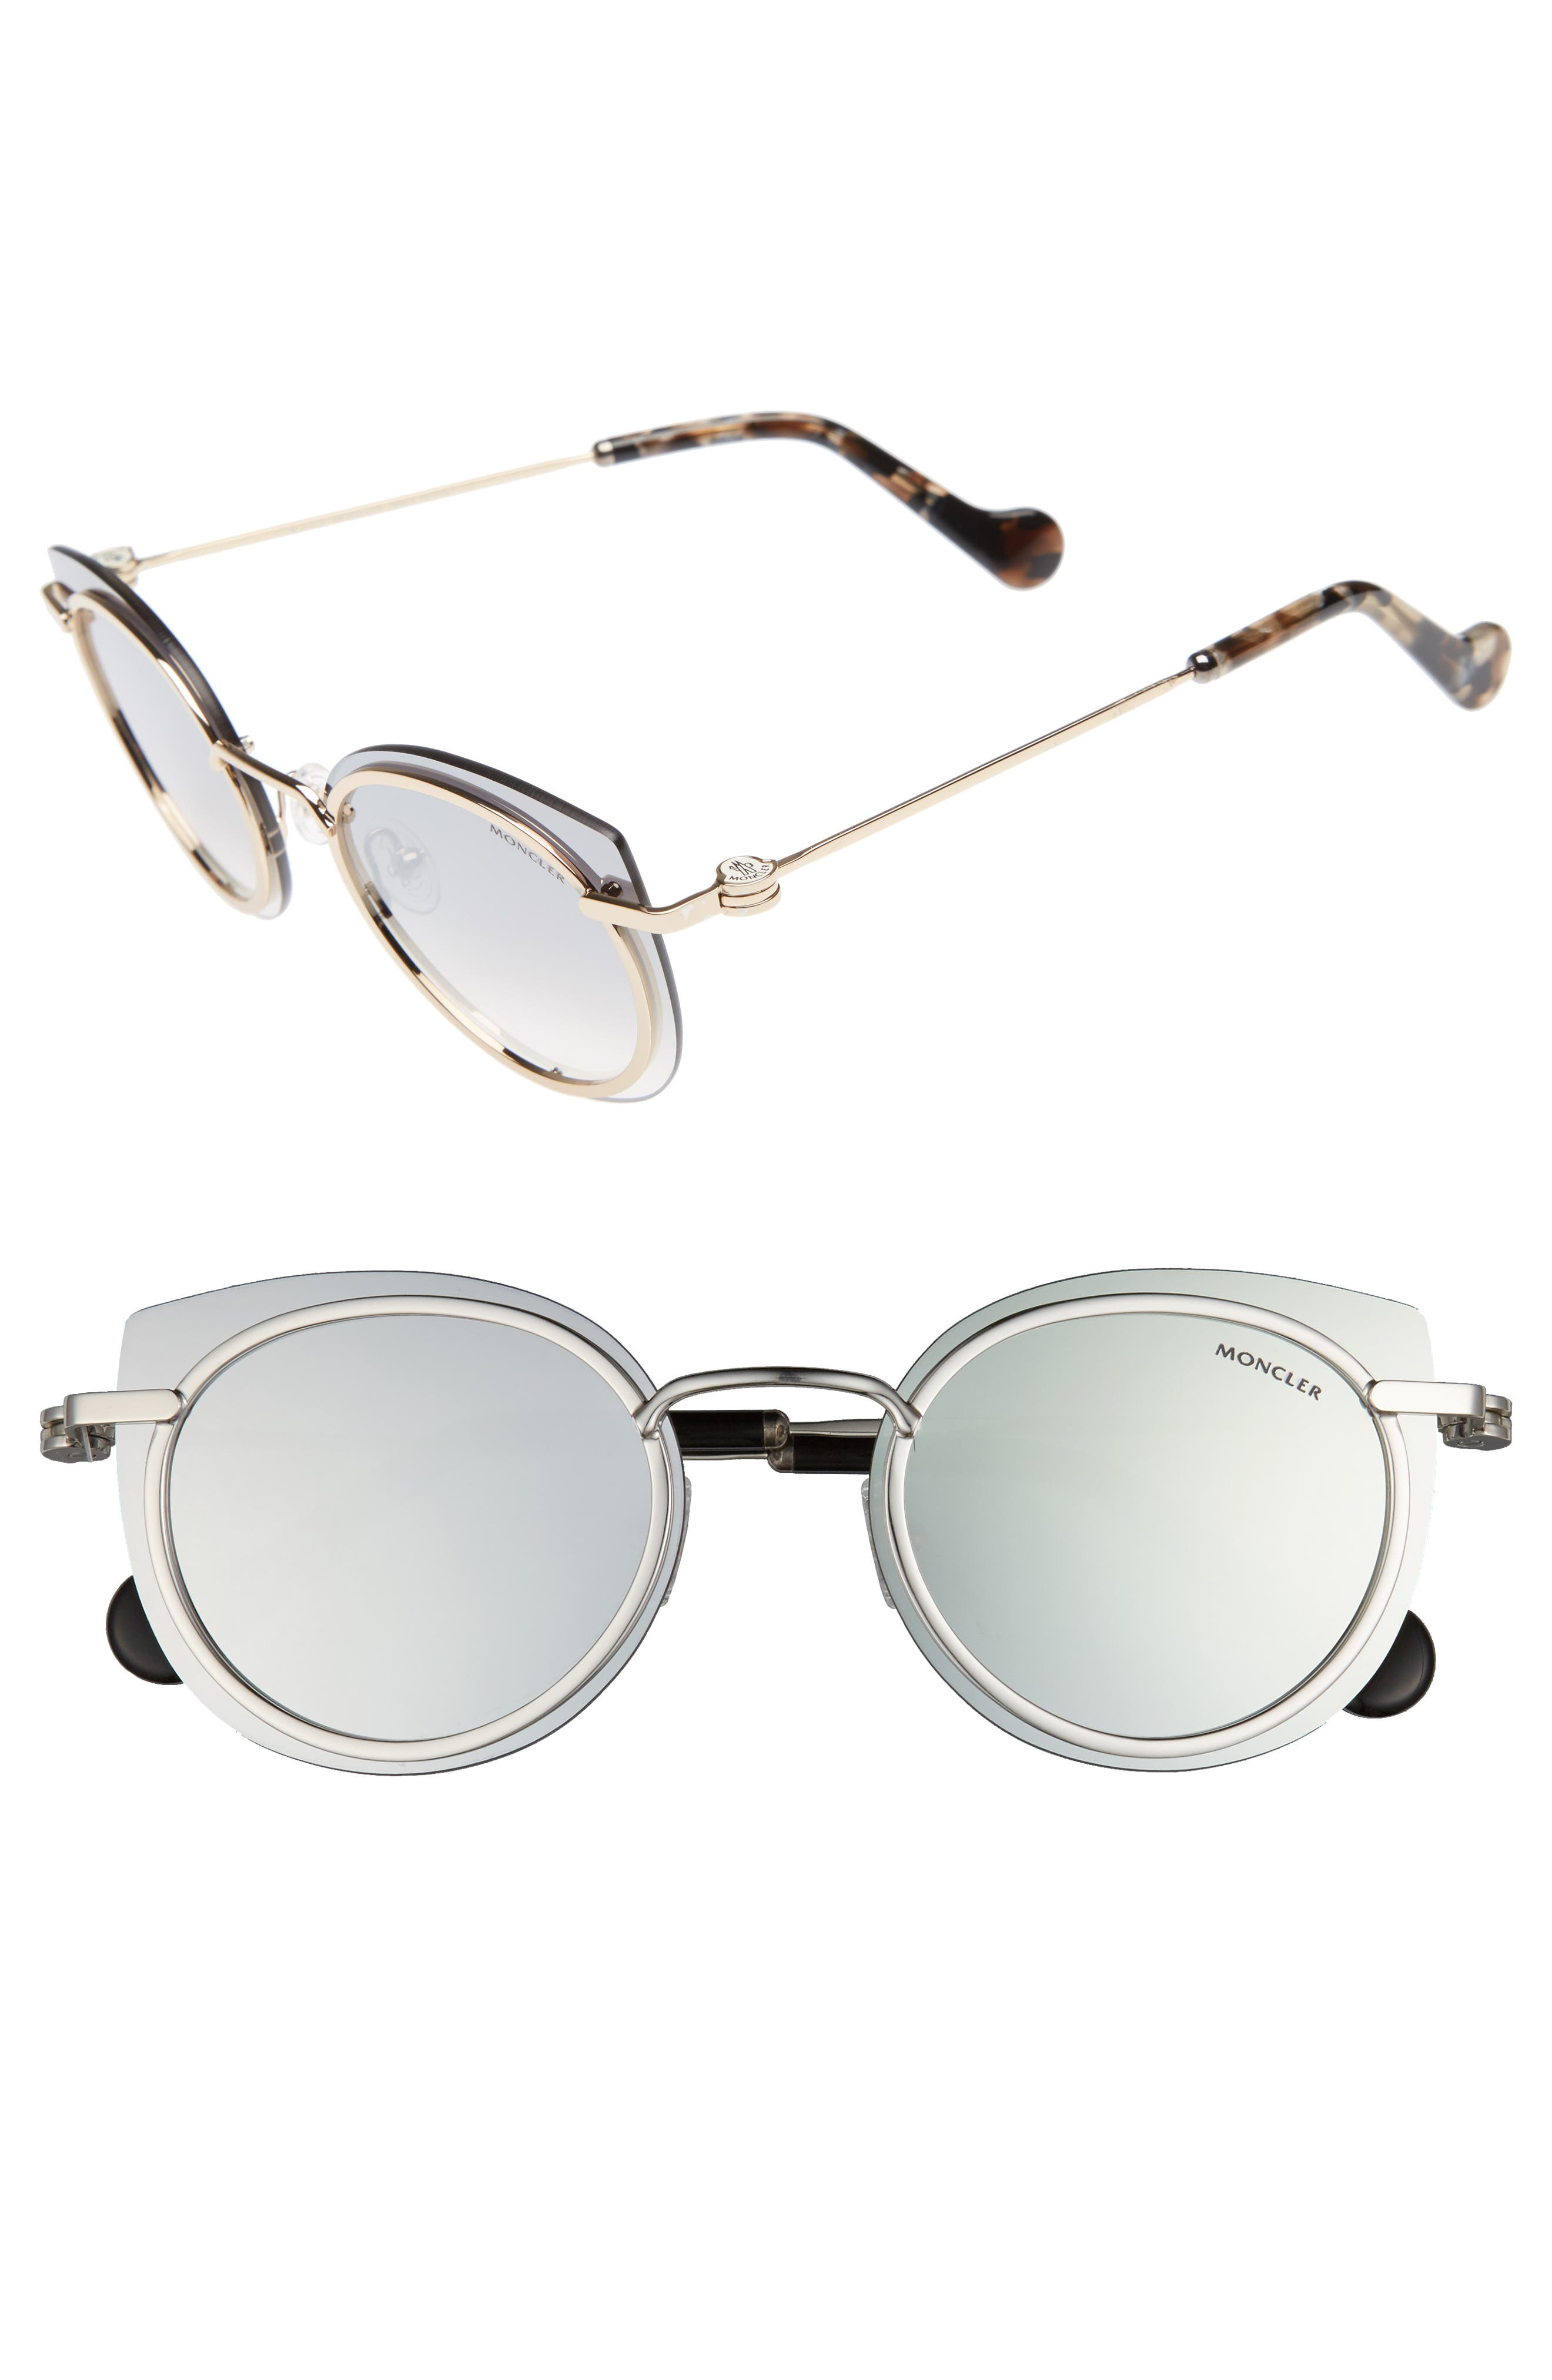 Moncler 56mm Mirrored Cat Eye Sunglasses